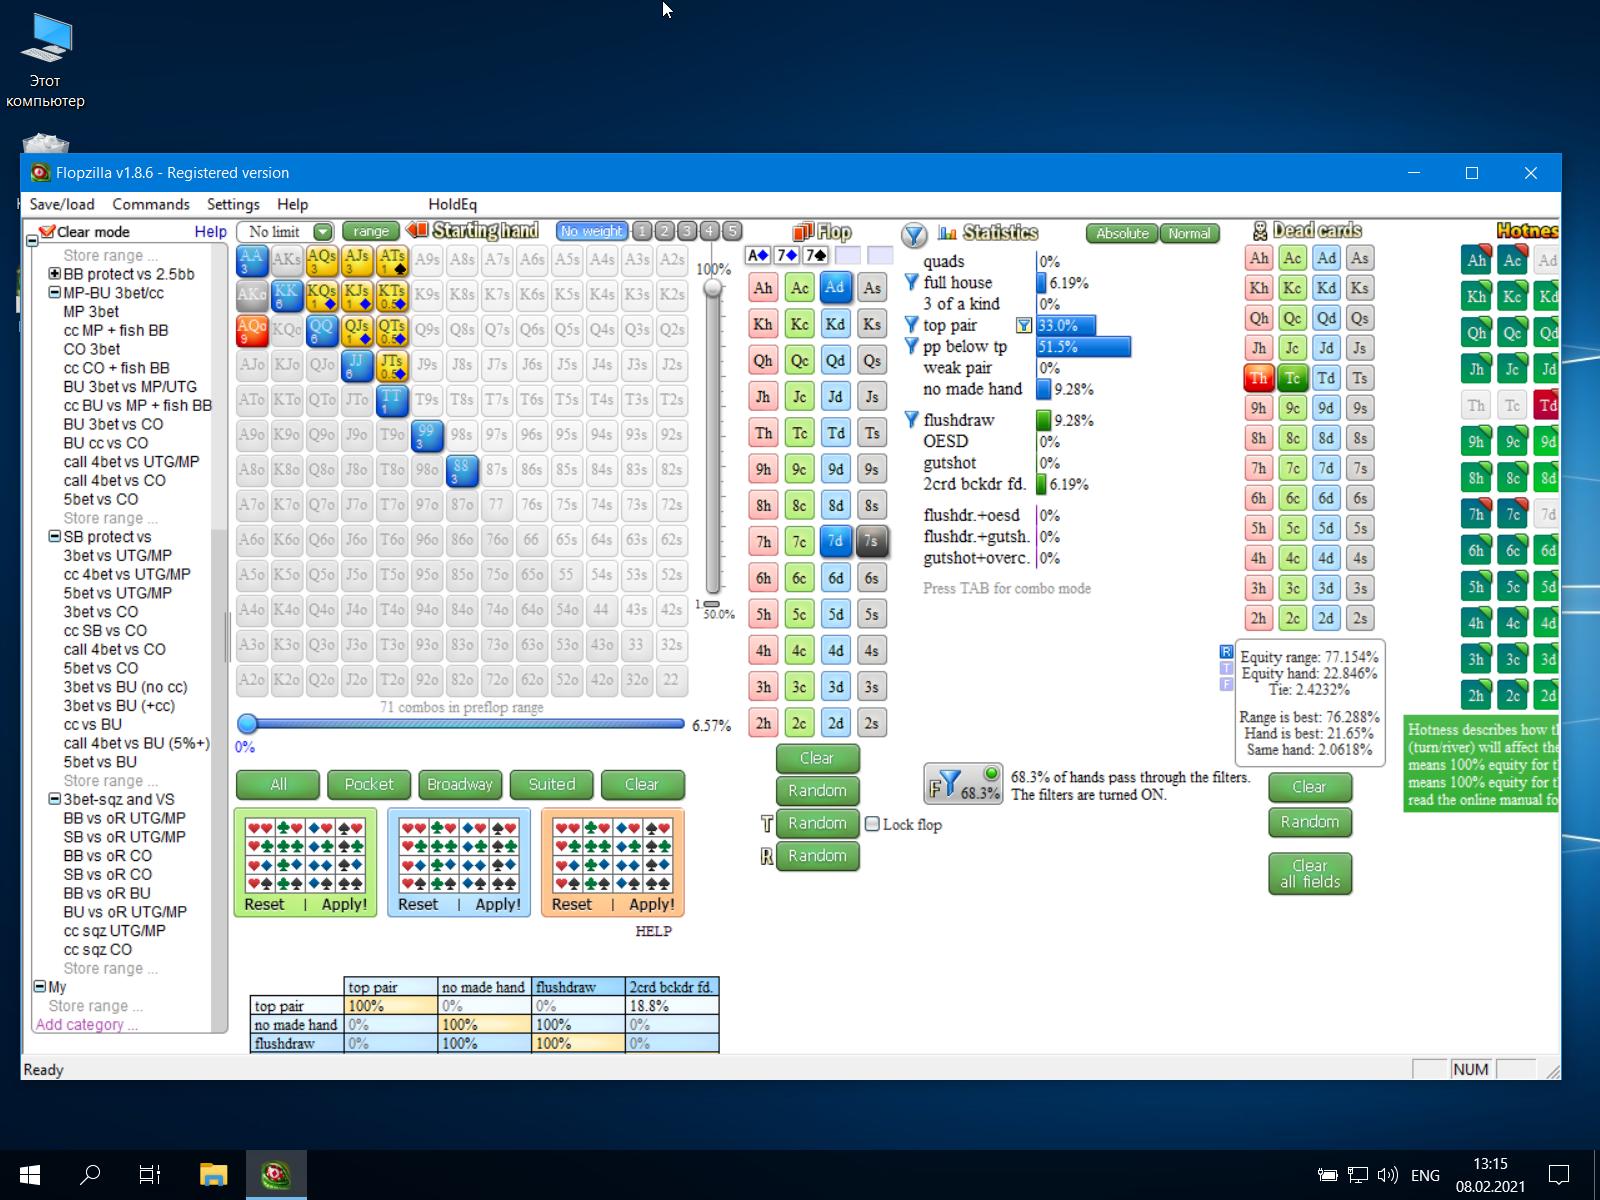 virtualboxwin-10080220211315501612779368.png